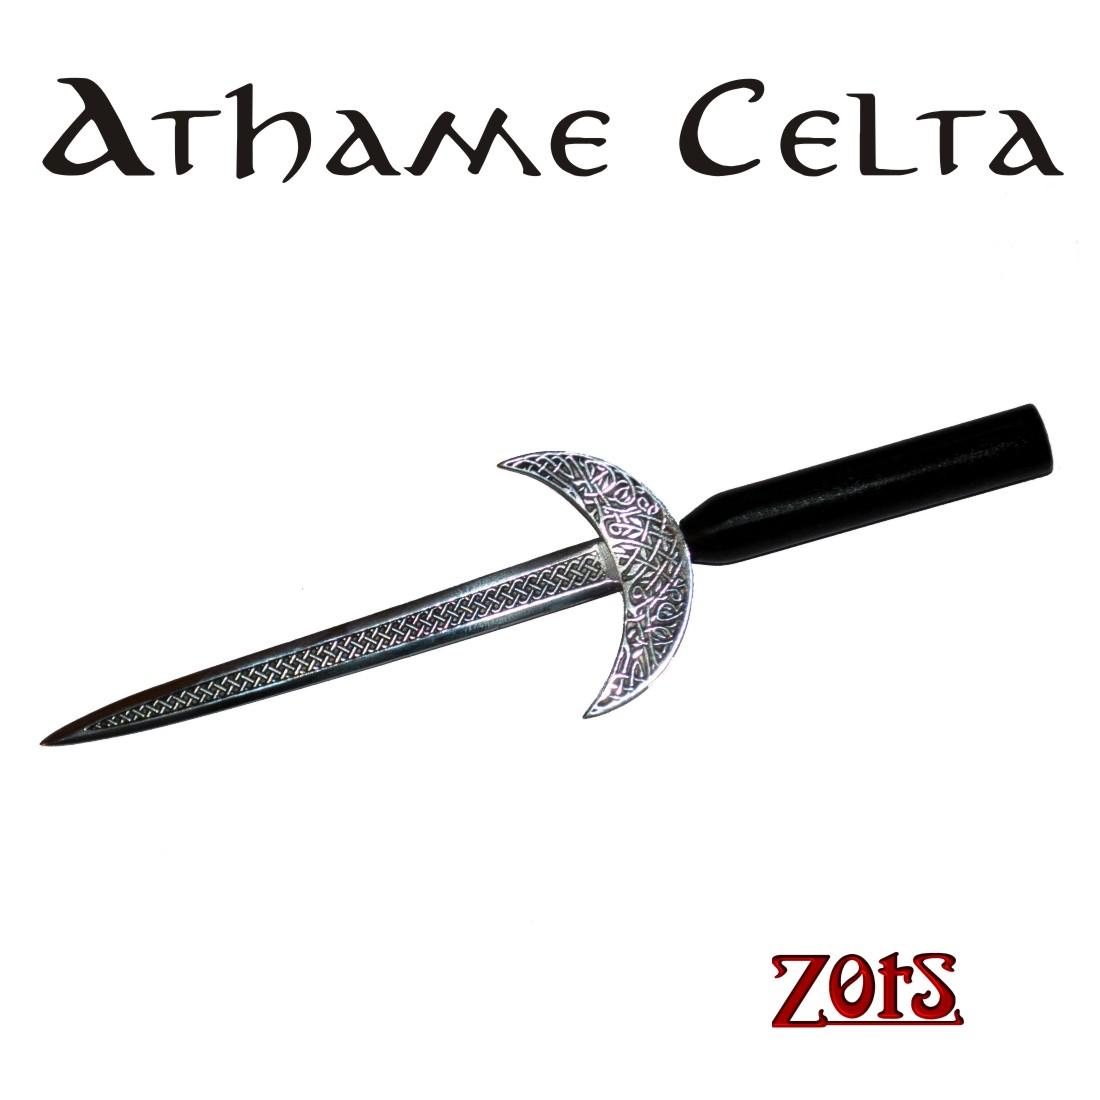 Athame Celta